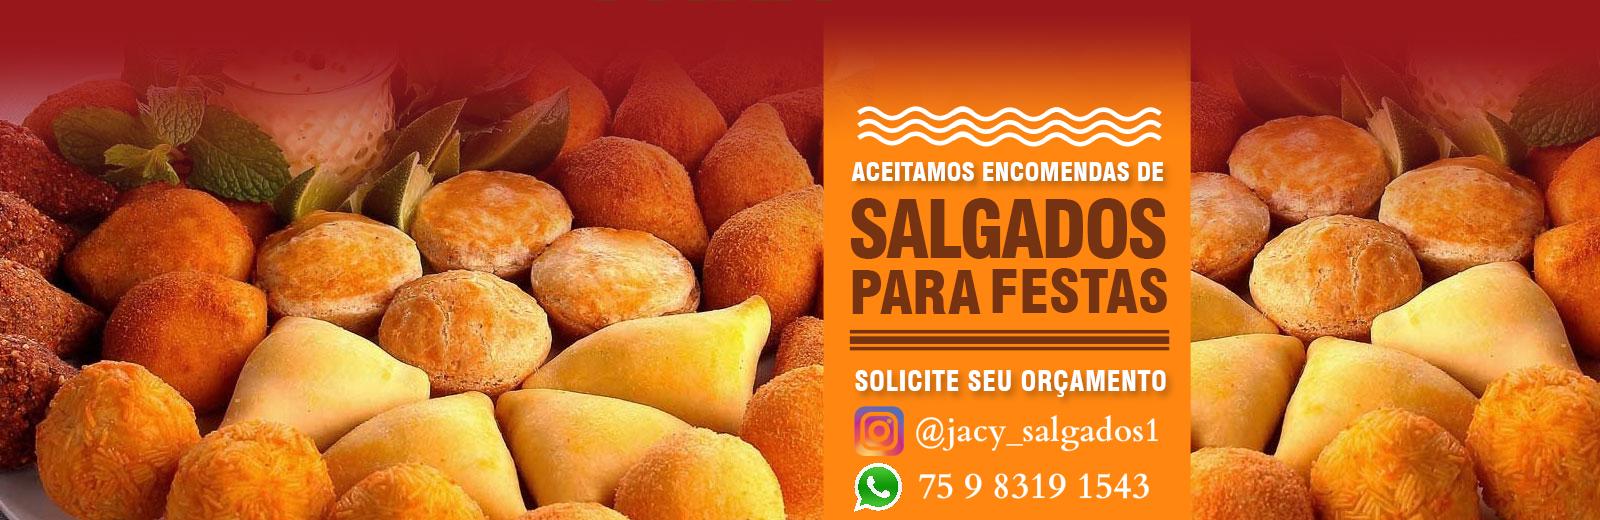 Jacy Salgados